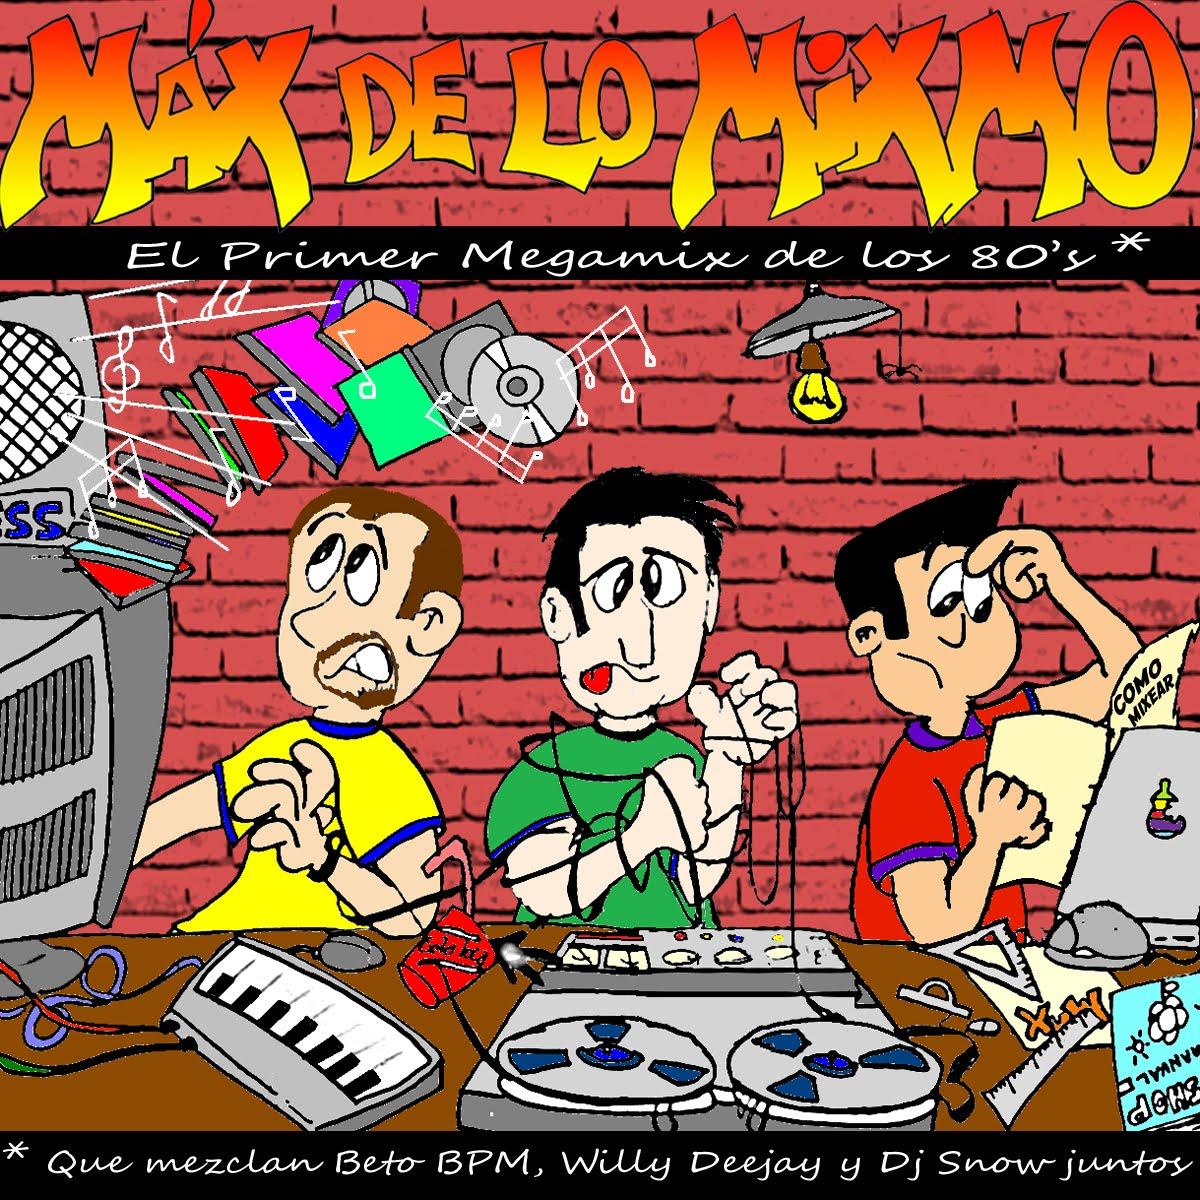 http://4.bp.blogspot.com/_8bUJIyy3Ecc/TMCLFNfl6nI/AAAAAAAAGXo/CNHYRRiDgp4/s1600/M%C3%A1x+de+lo+Mixmo+(Single).jpg